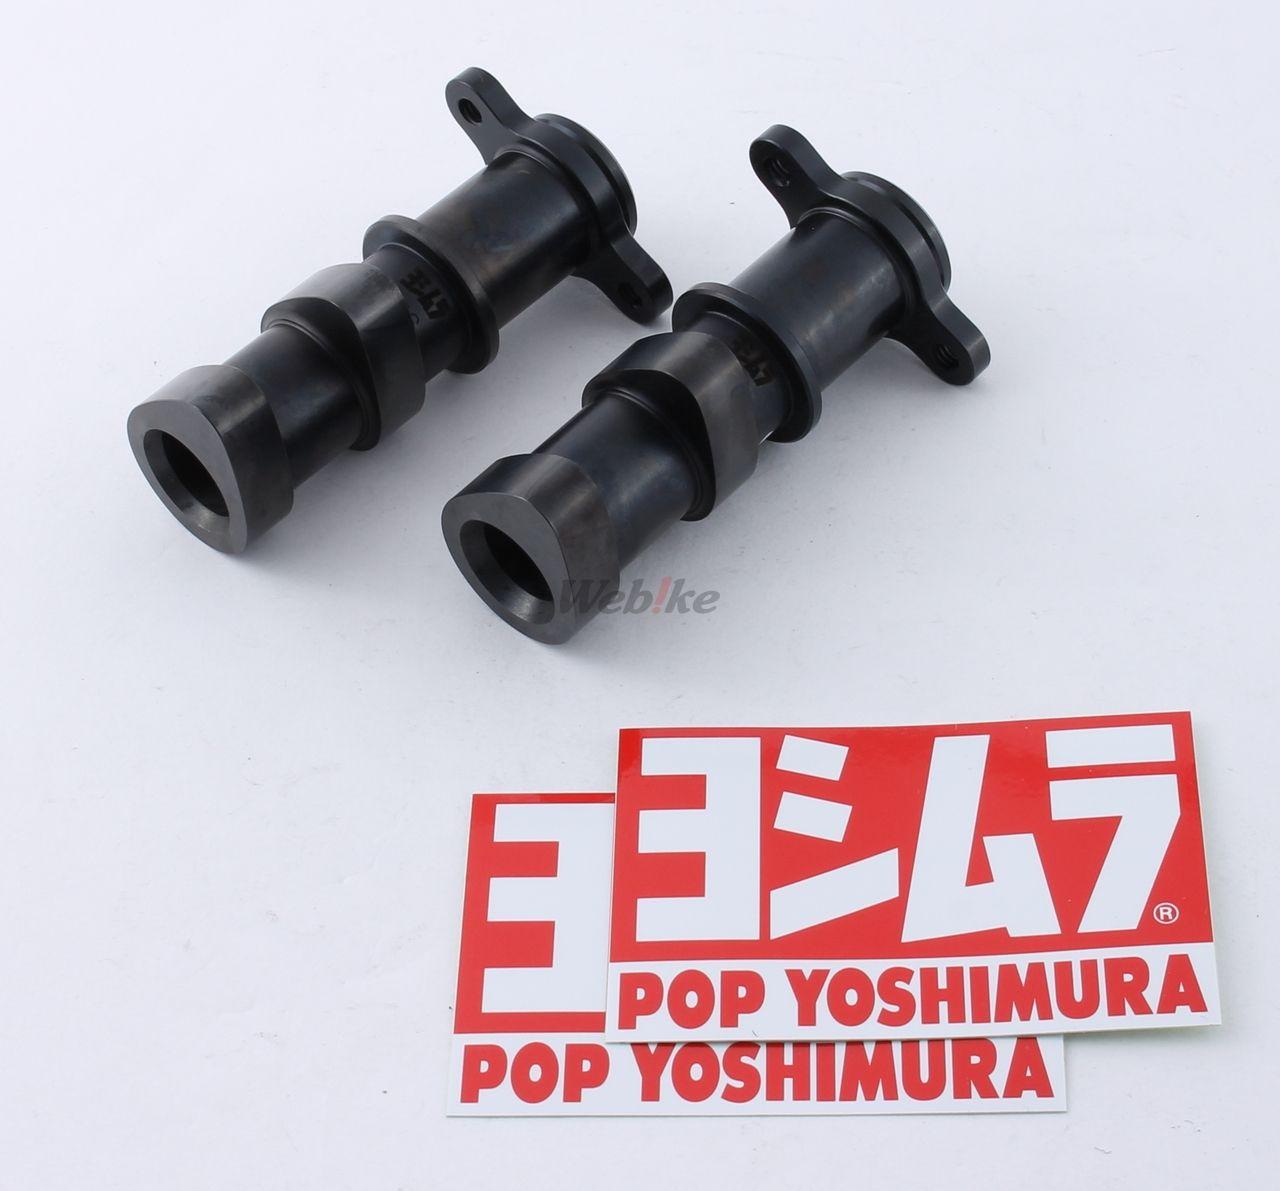 【YOSHIMURA】ST-1 改裝凸輪軸 - 「Webike-摩托百貨」